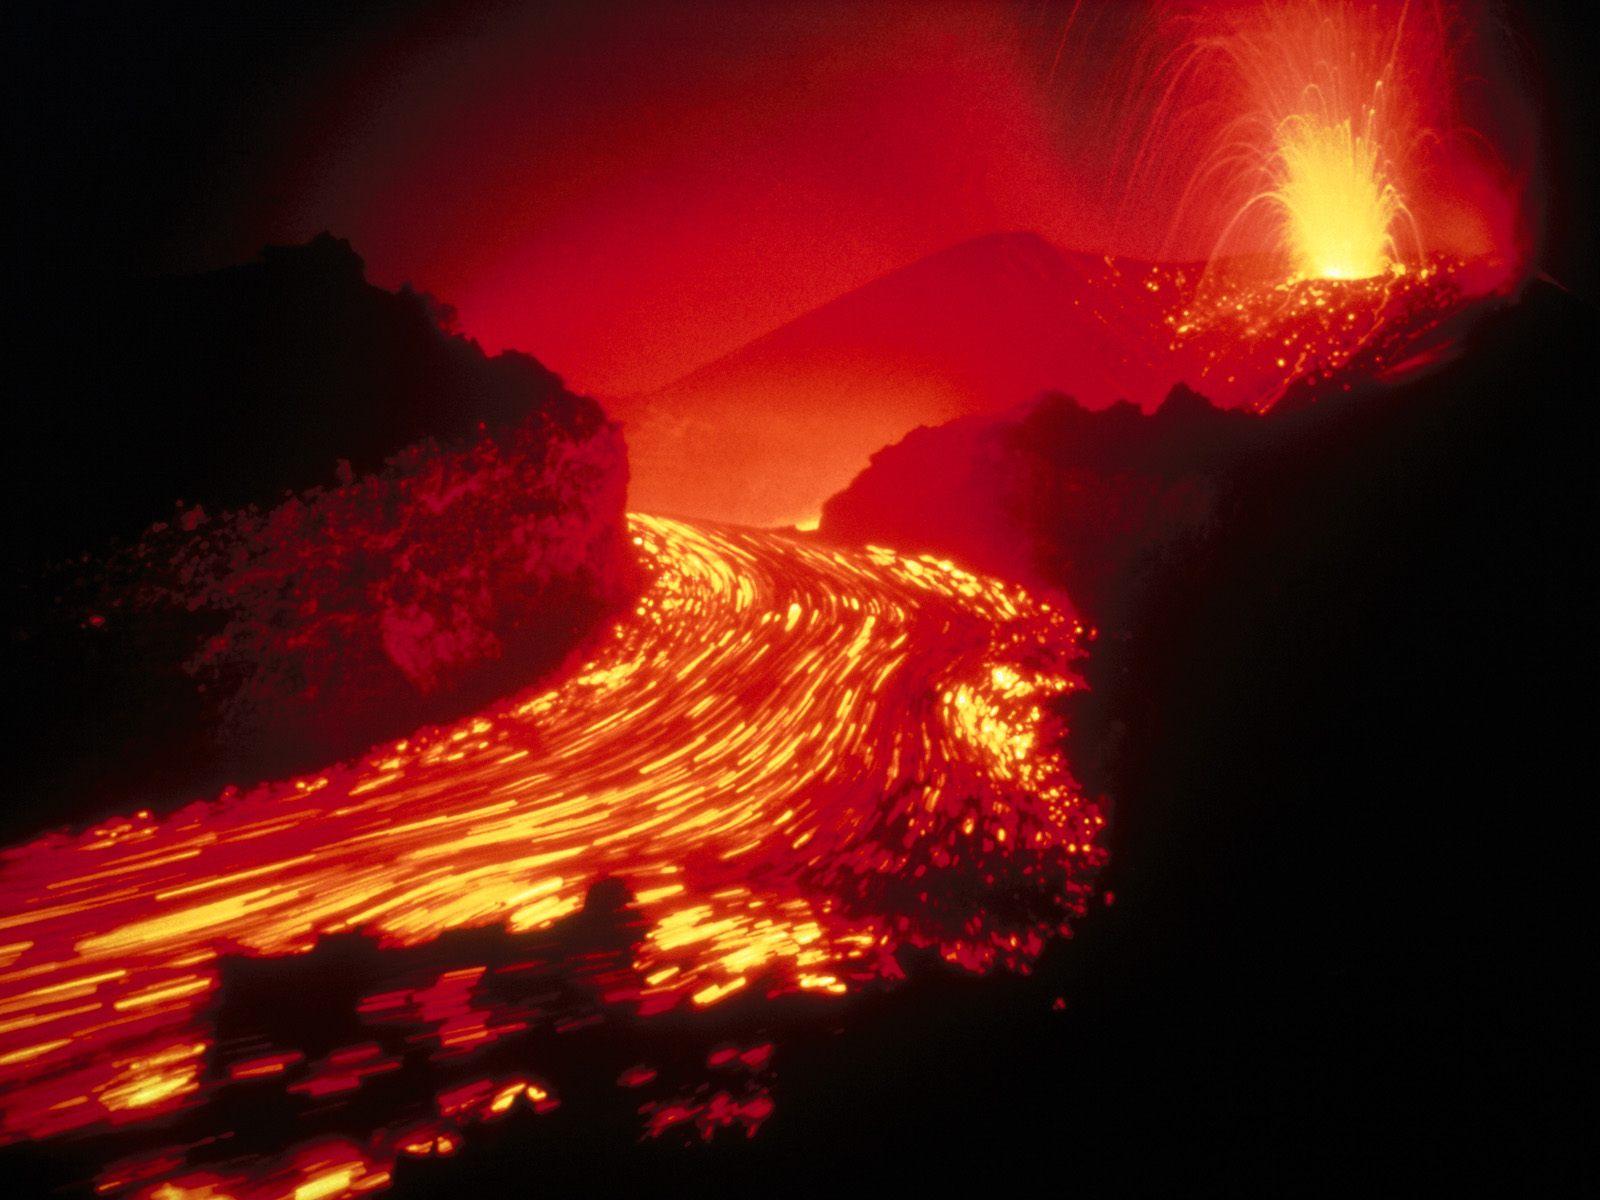 Types of Eruption